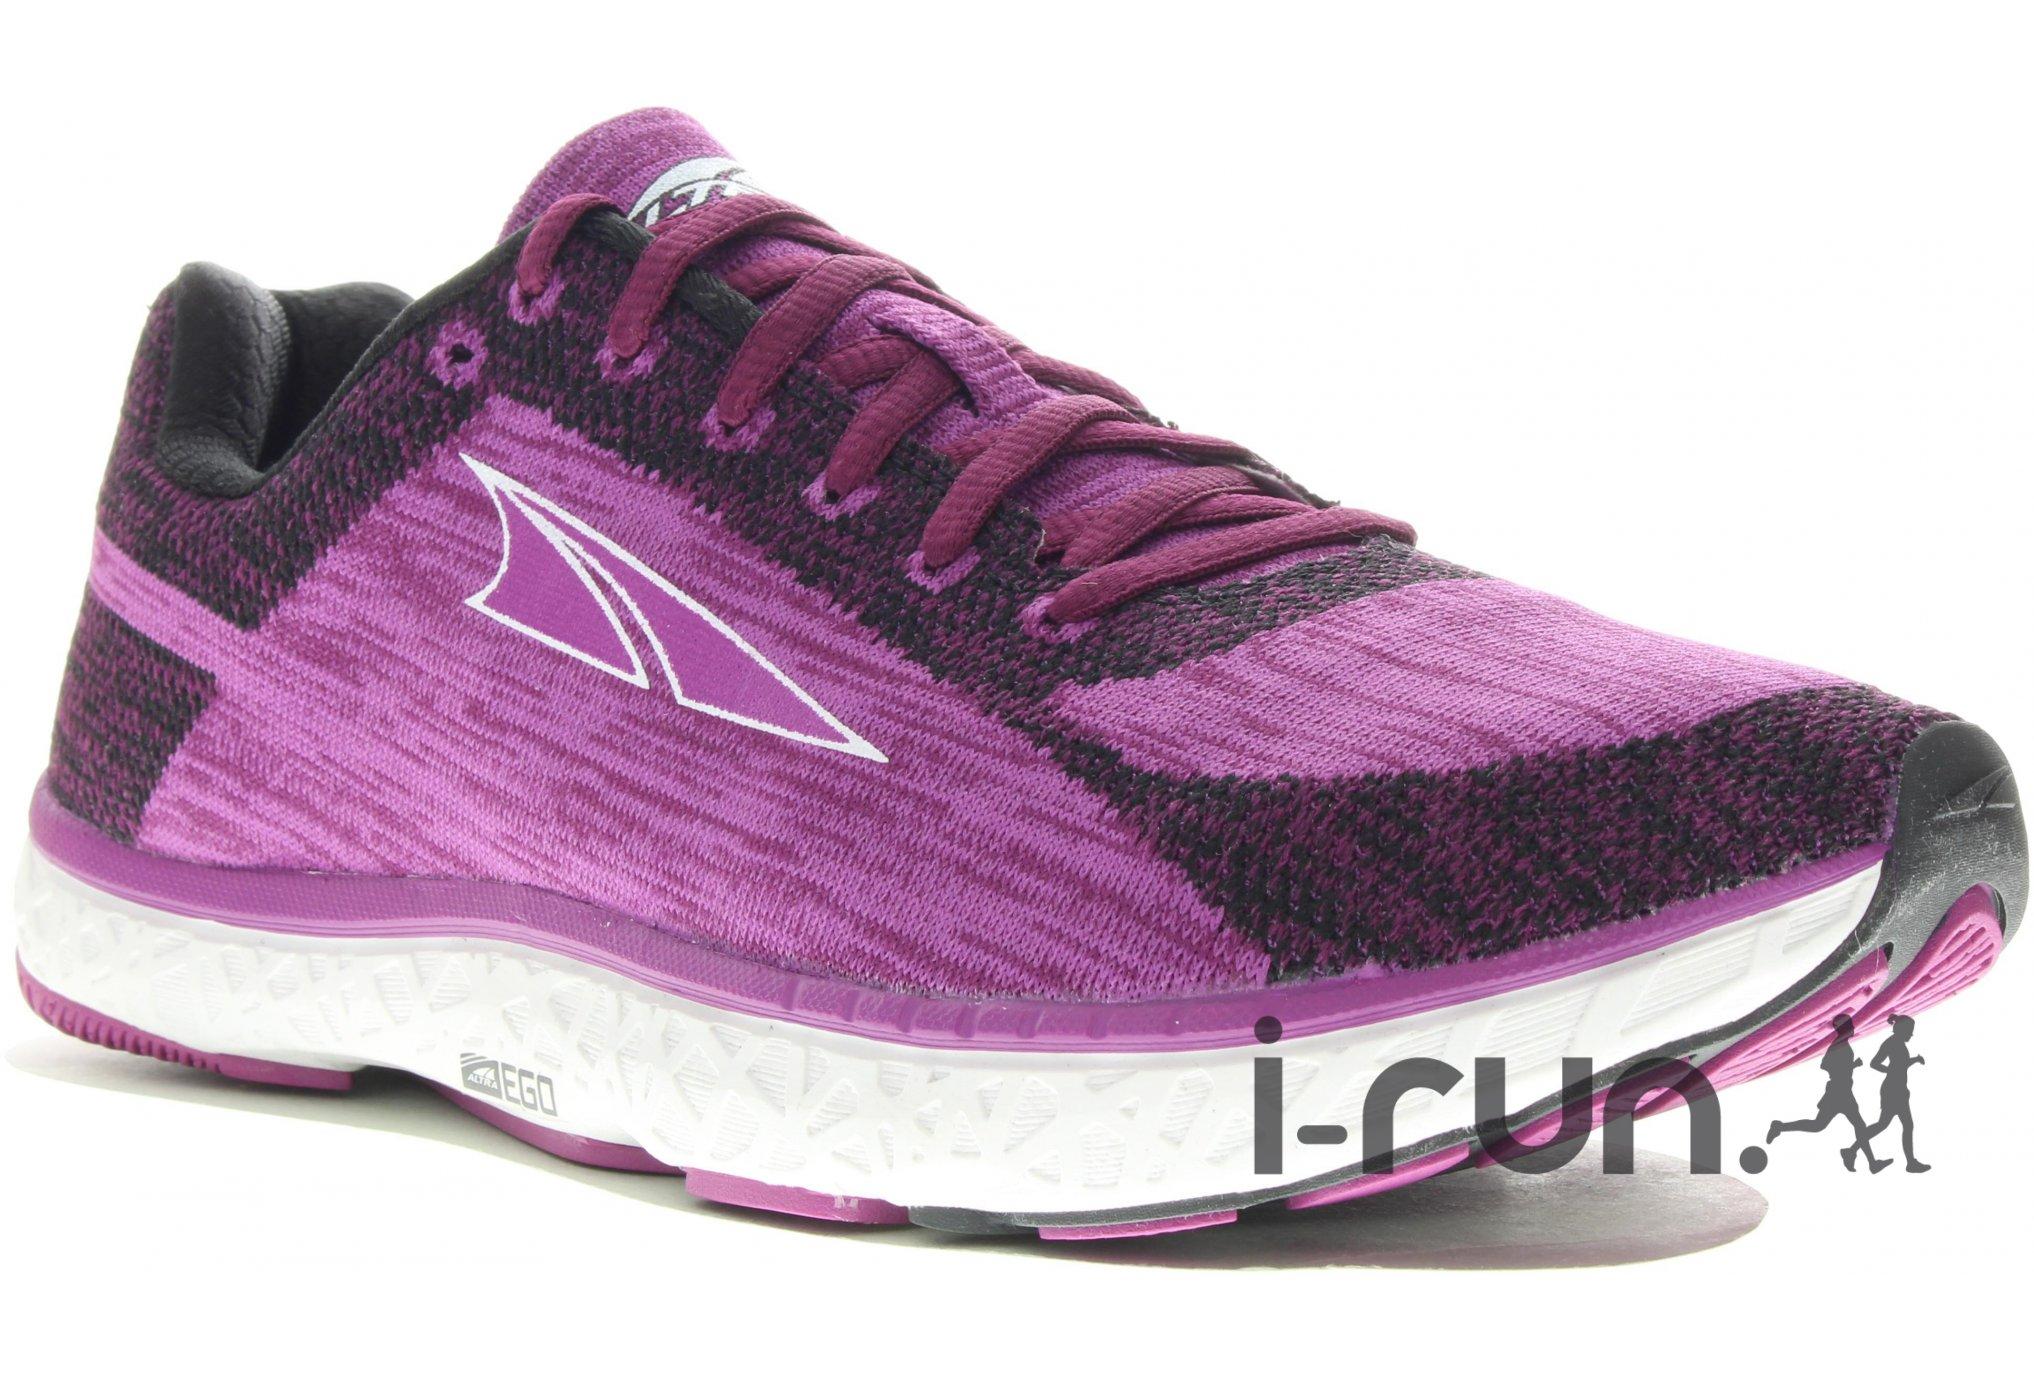 Altra Escalante w chaussures running femme